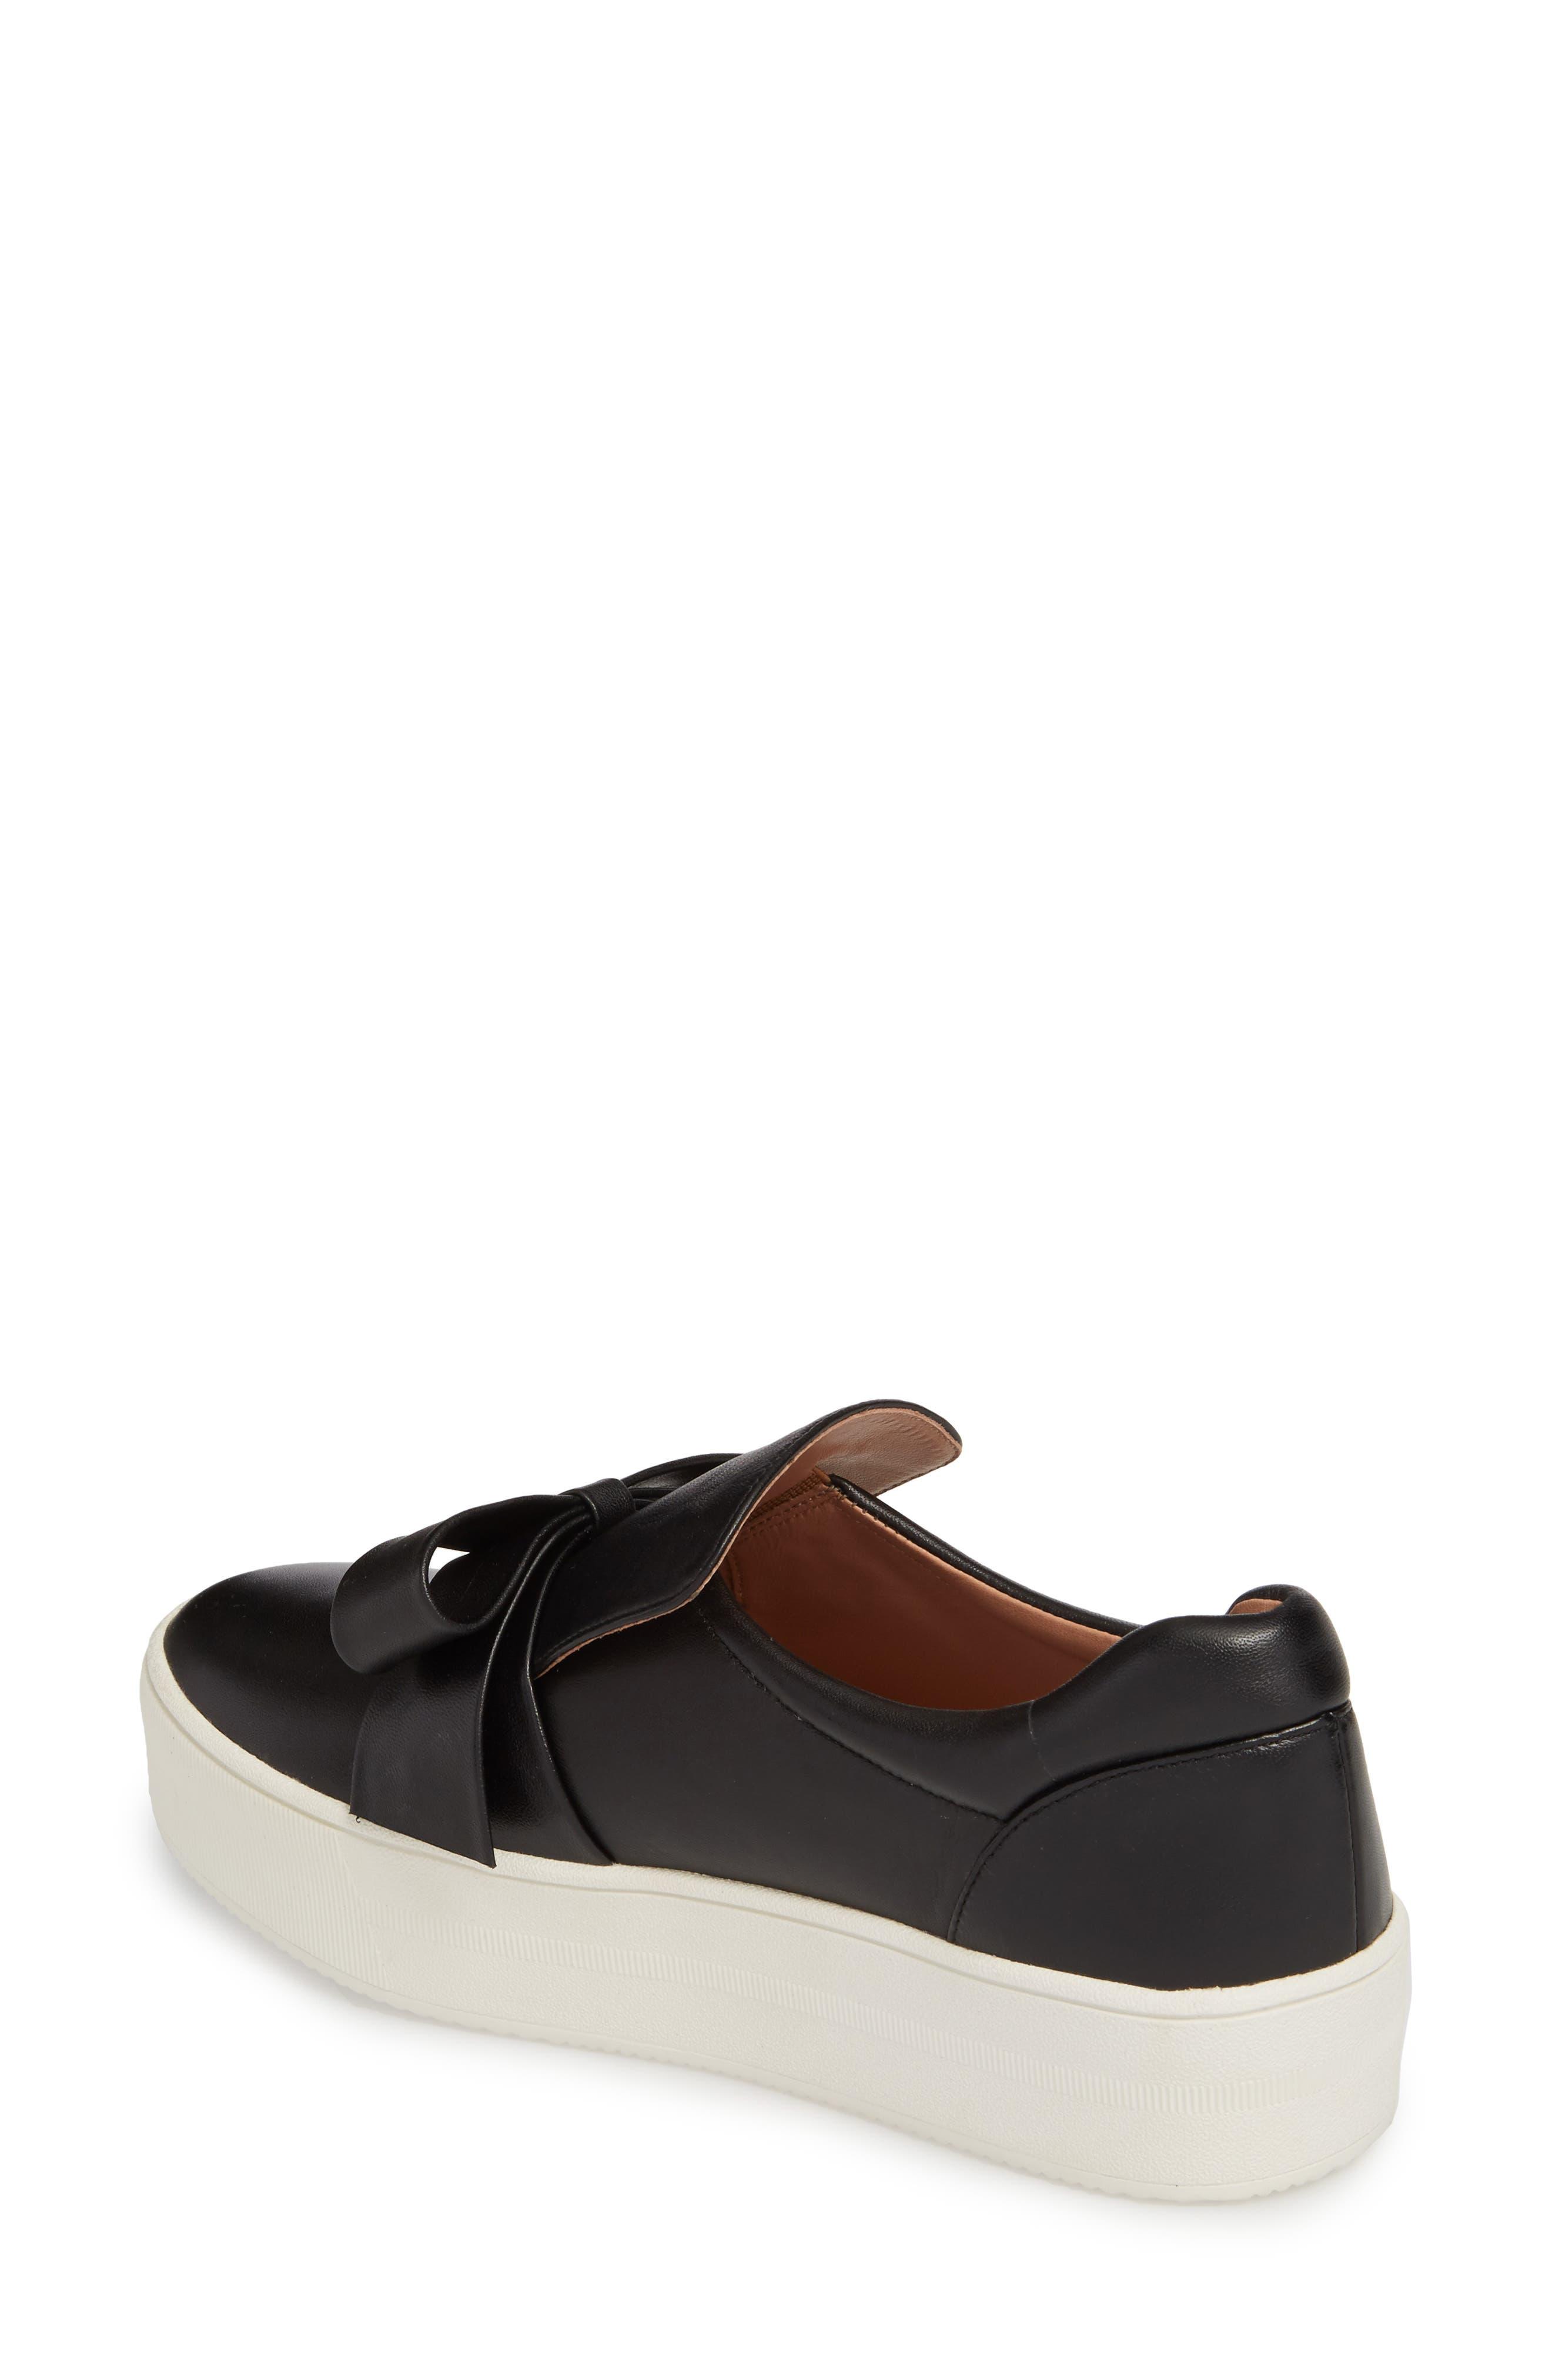 Vania Bow Platform Sneaker,                             Alternate thumbnail 2, color,                             Black Leather